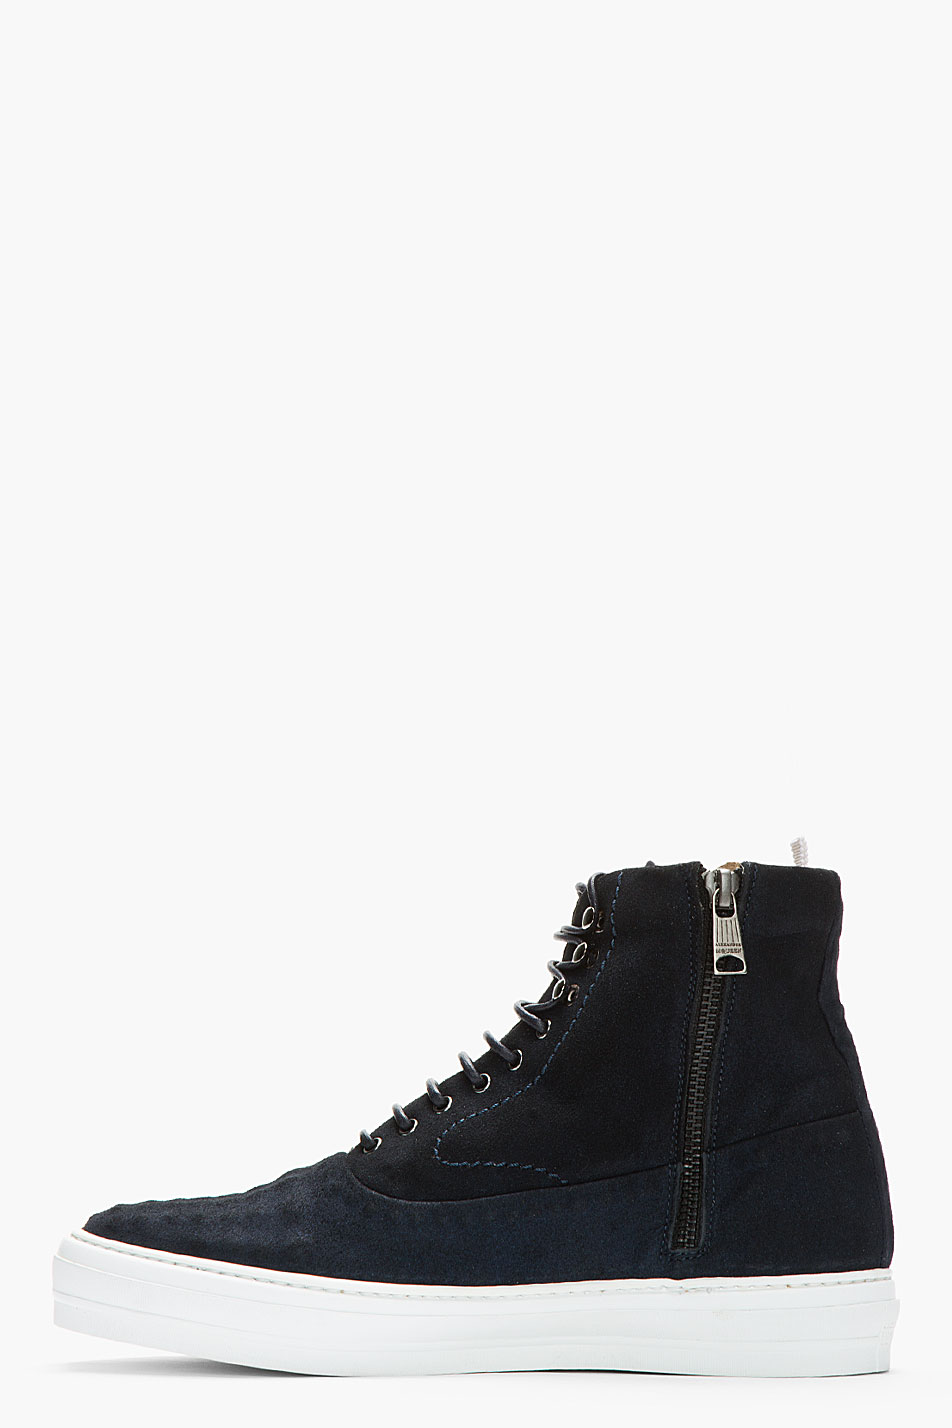 Deep Blue Covered stud sneakers suede Alexander McQueen 2